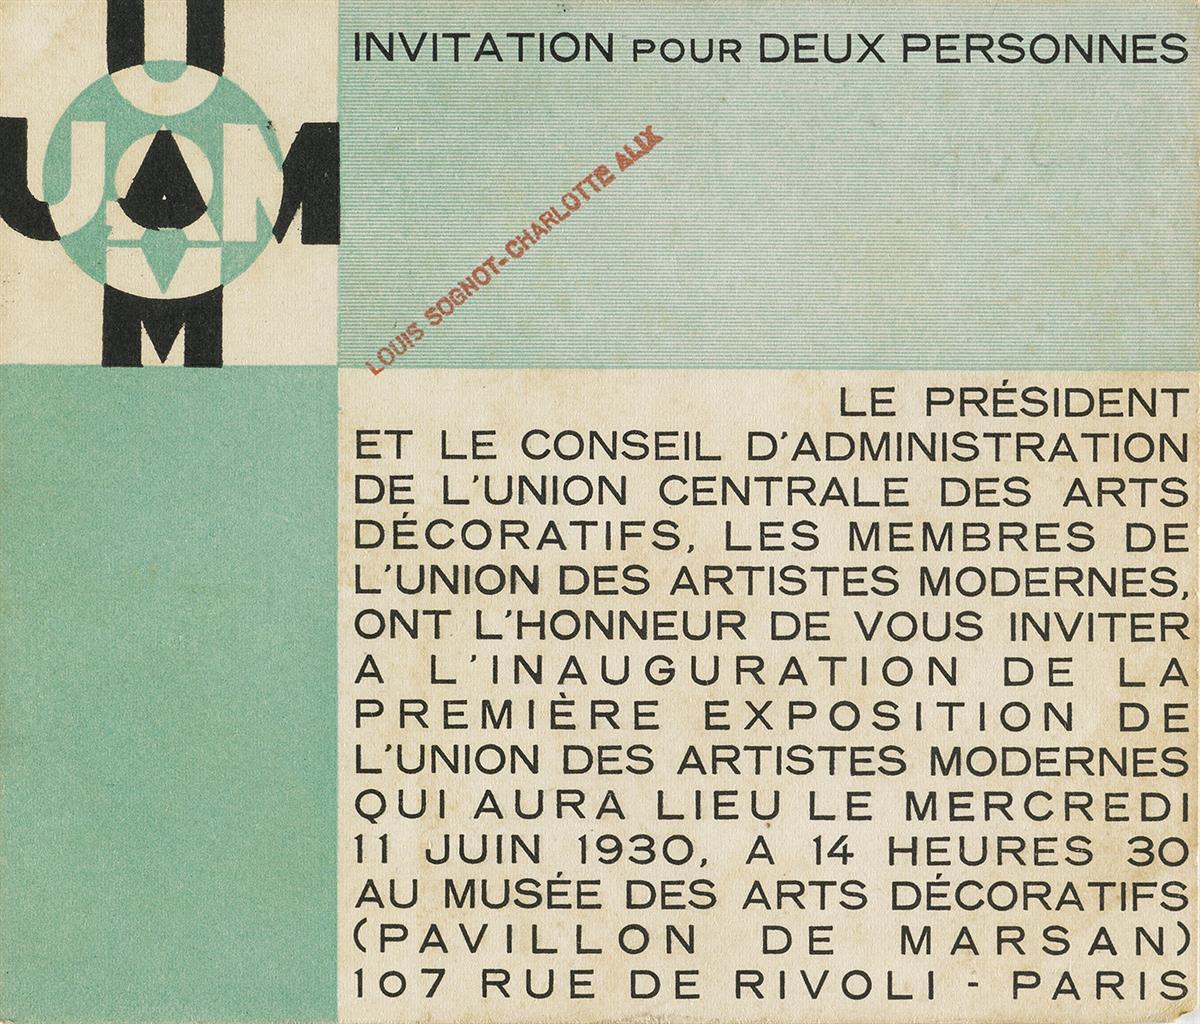 DESIGNER-UNKNOWN-UNION-DES-ARTISTES-MODERNES-Invitation-1930